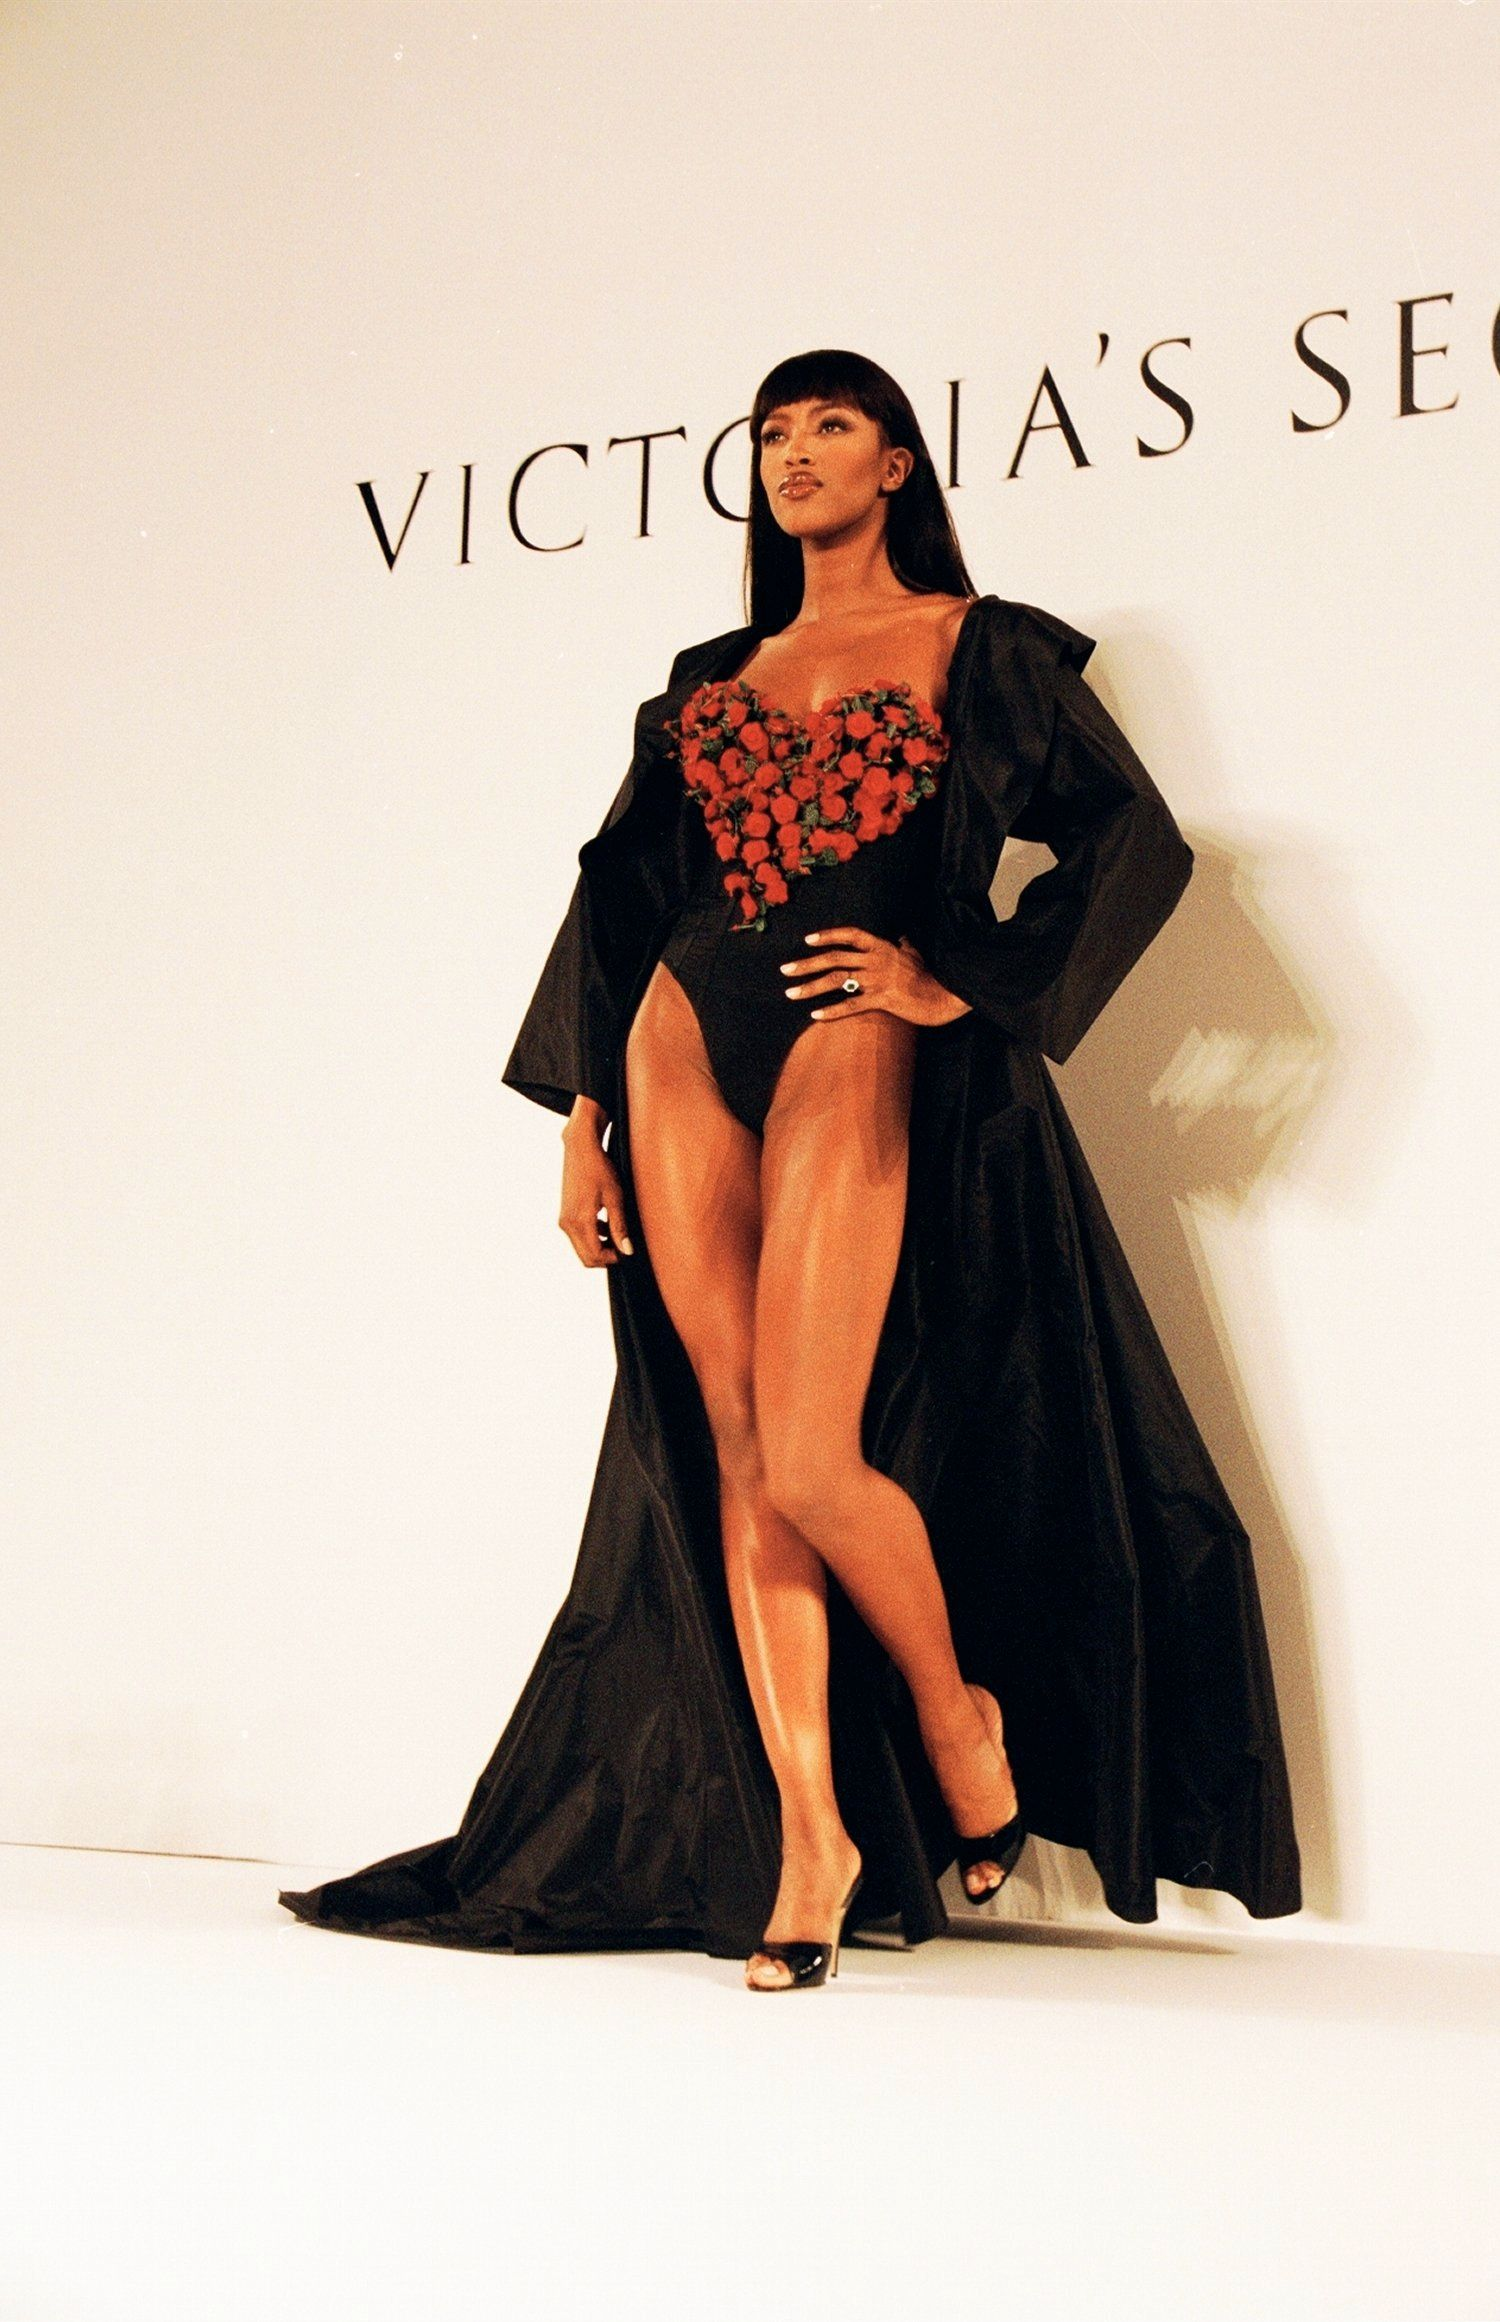 Walking in a Victoria's Secret show.